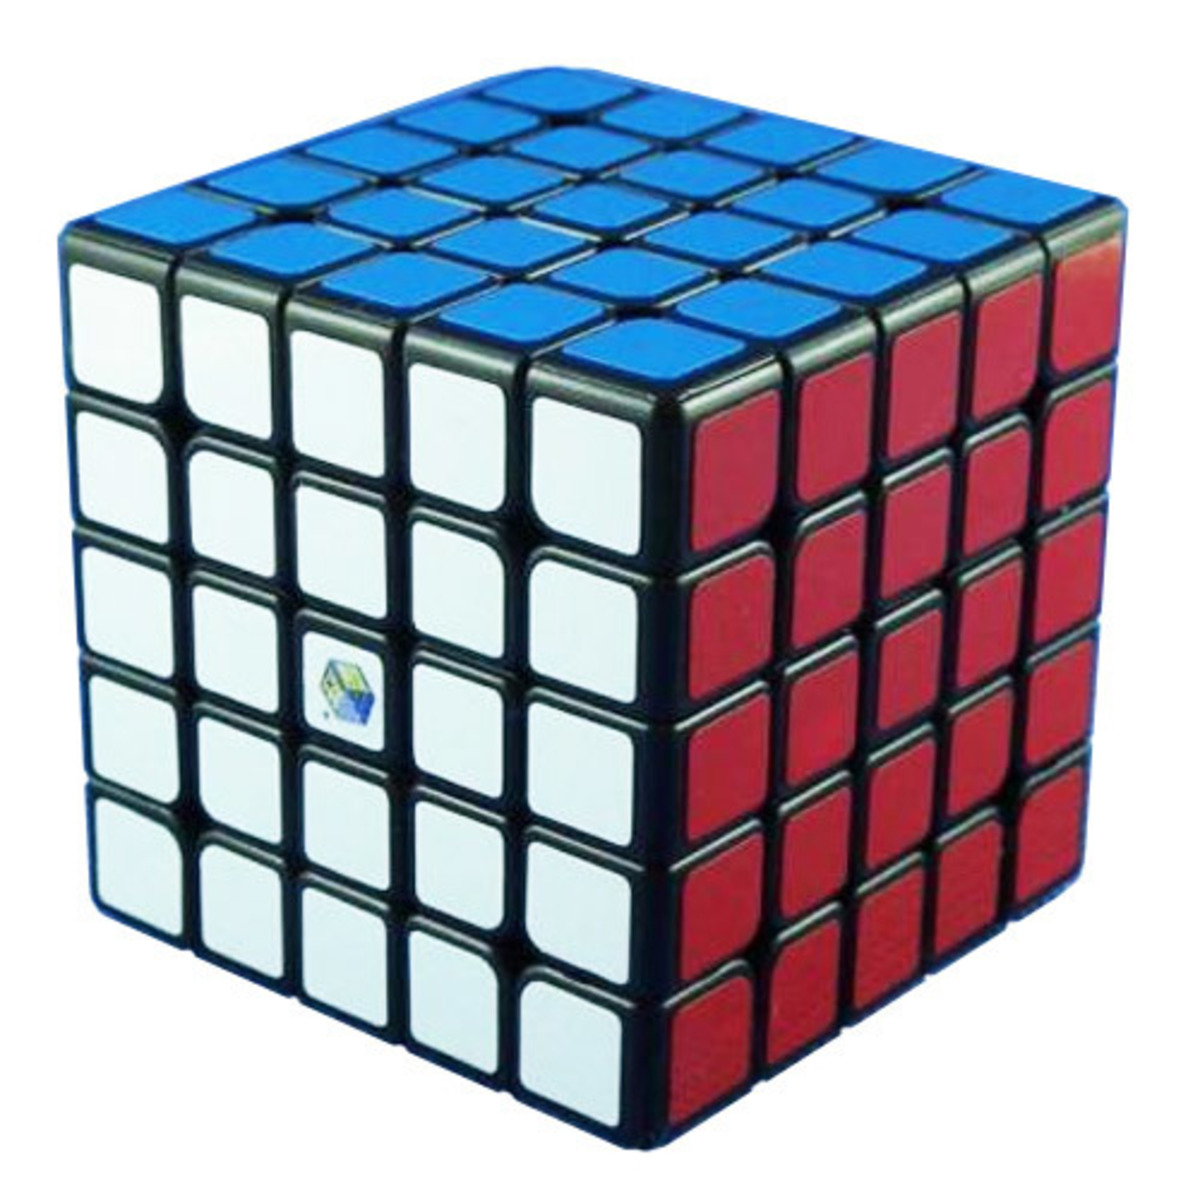 5x5x5 Yuxin